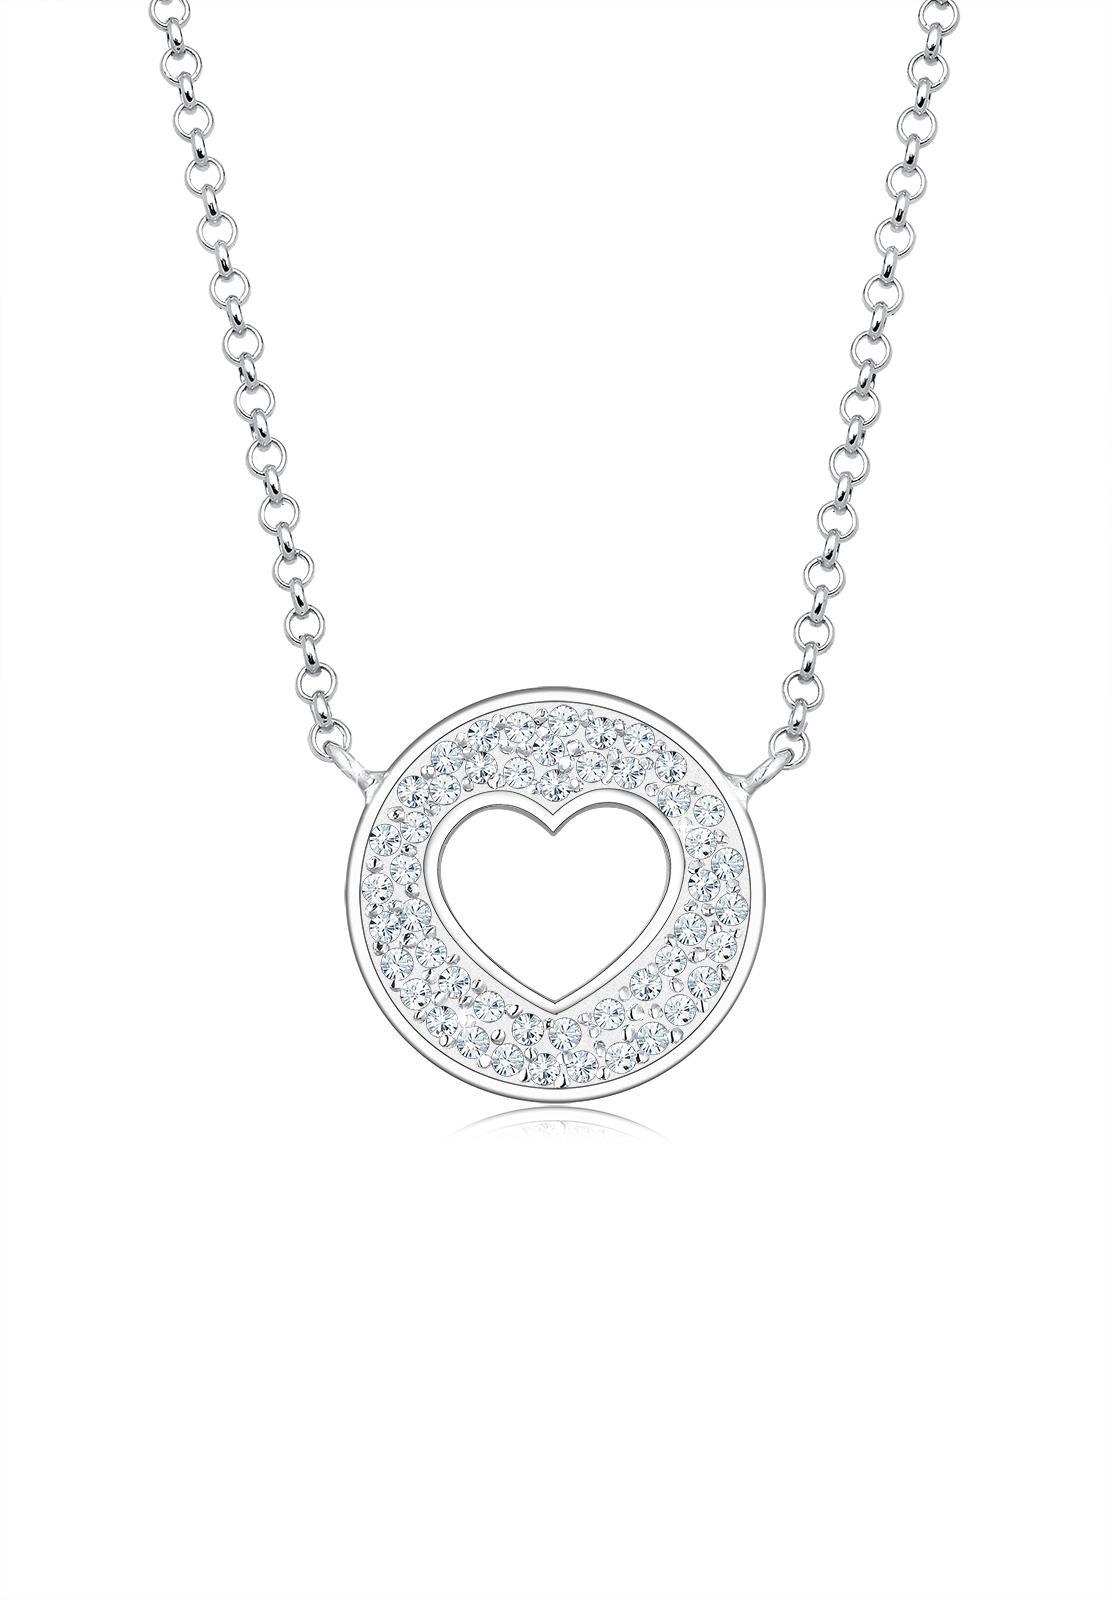 Beli Elli Germany 925 Sterling Silver Kalung Heart Coin Swarovski® Silver Online Terpercaya